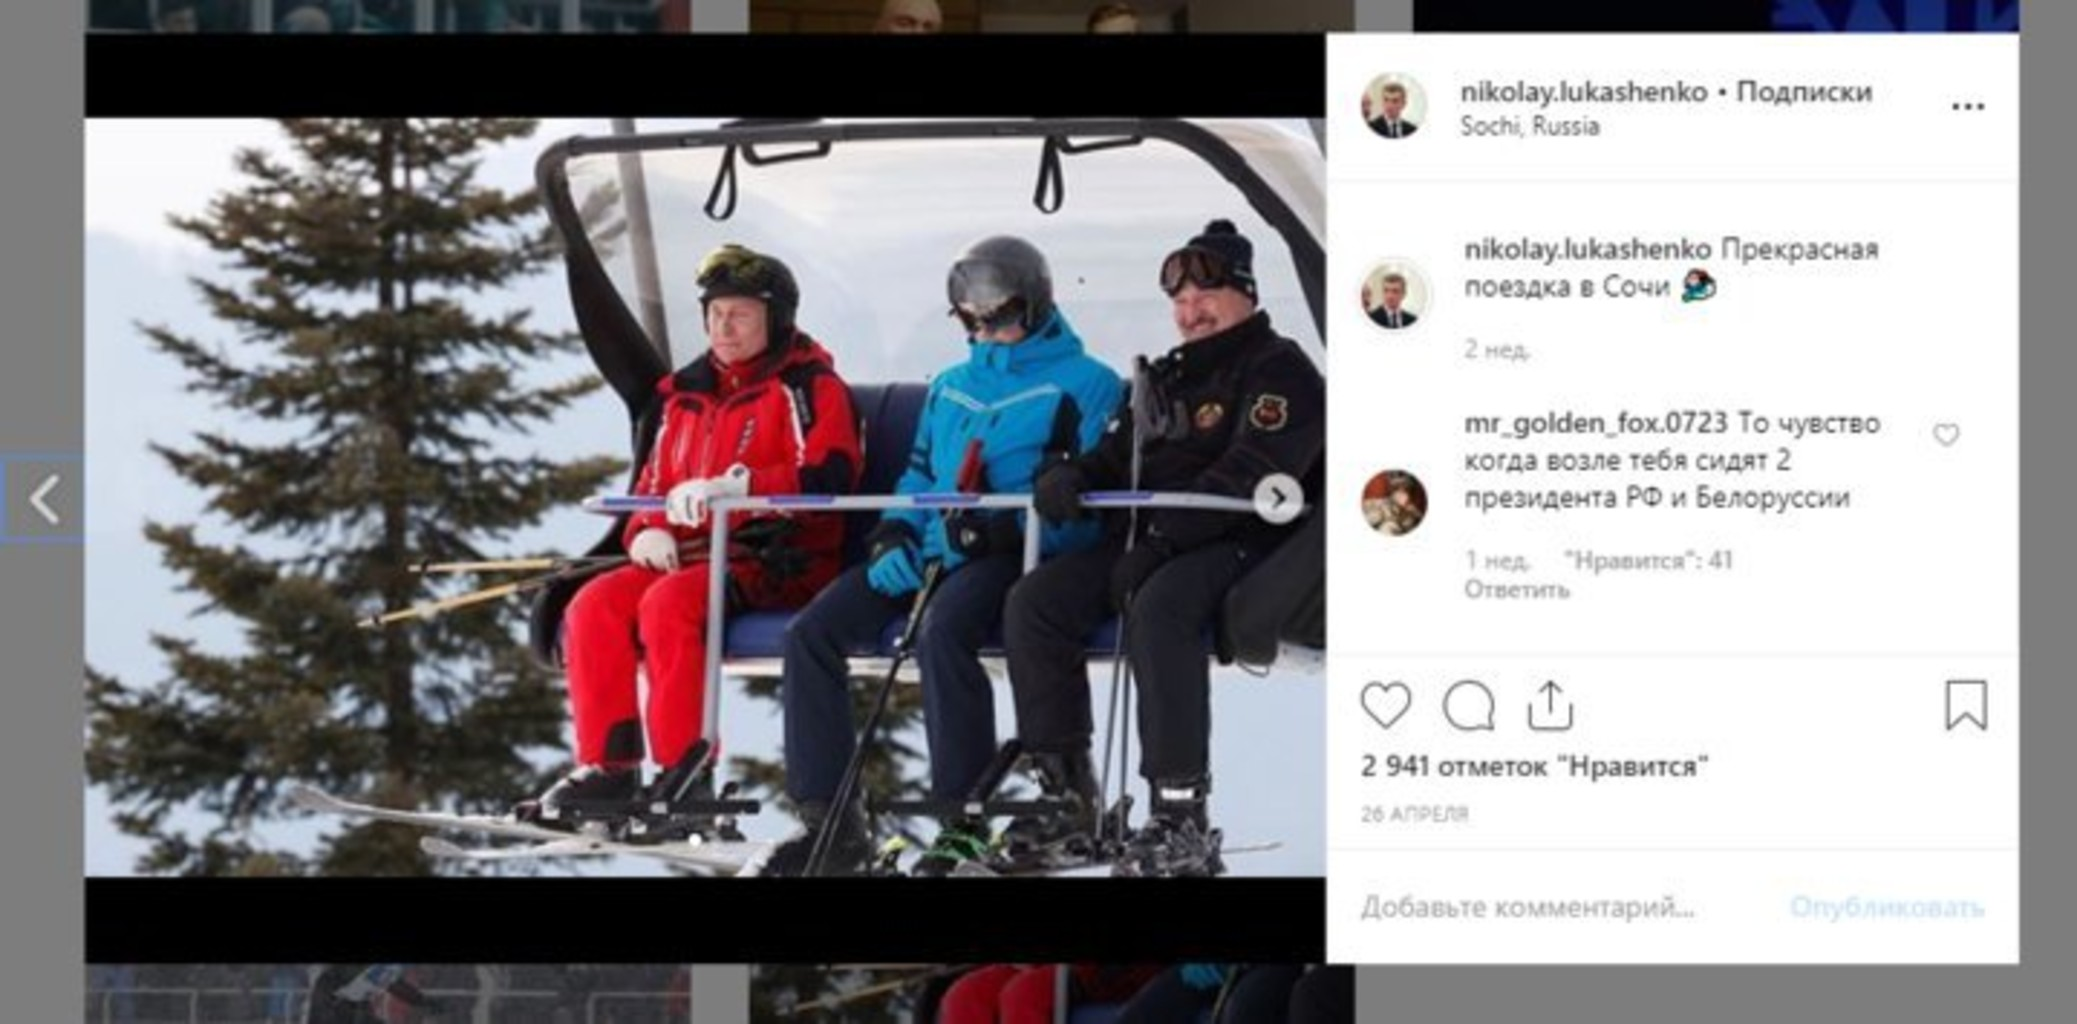 Instagram nikolaya lukashenko 10